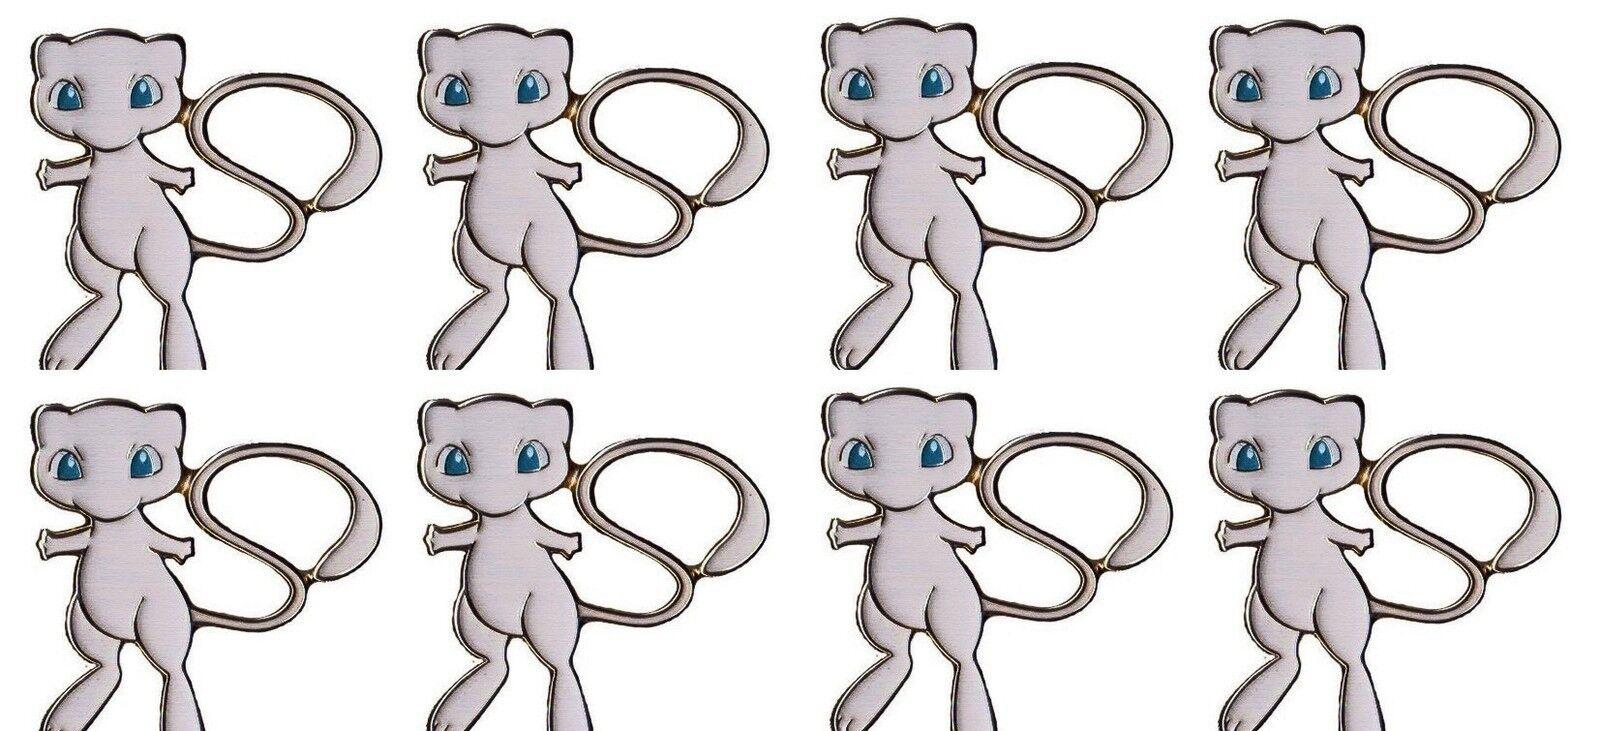 30 x New Myth Collection pokemon tcgo Pins Mint